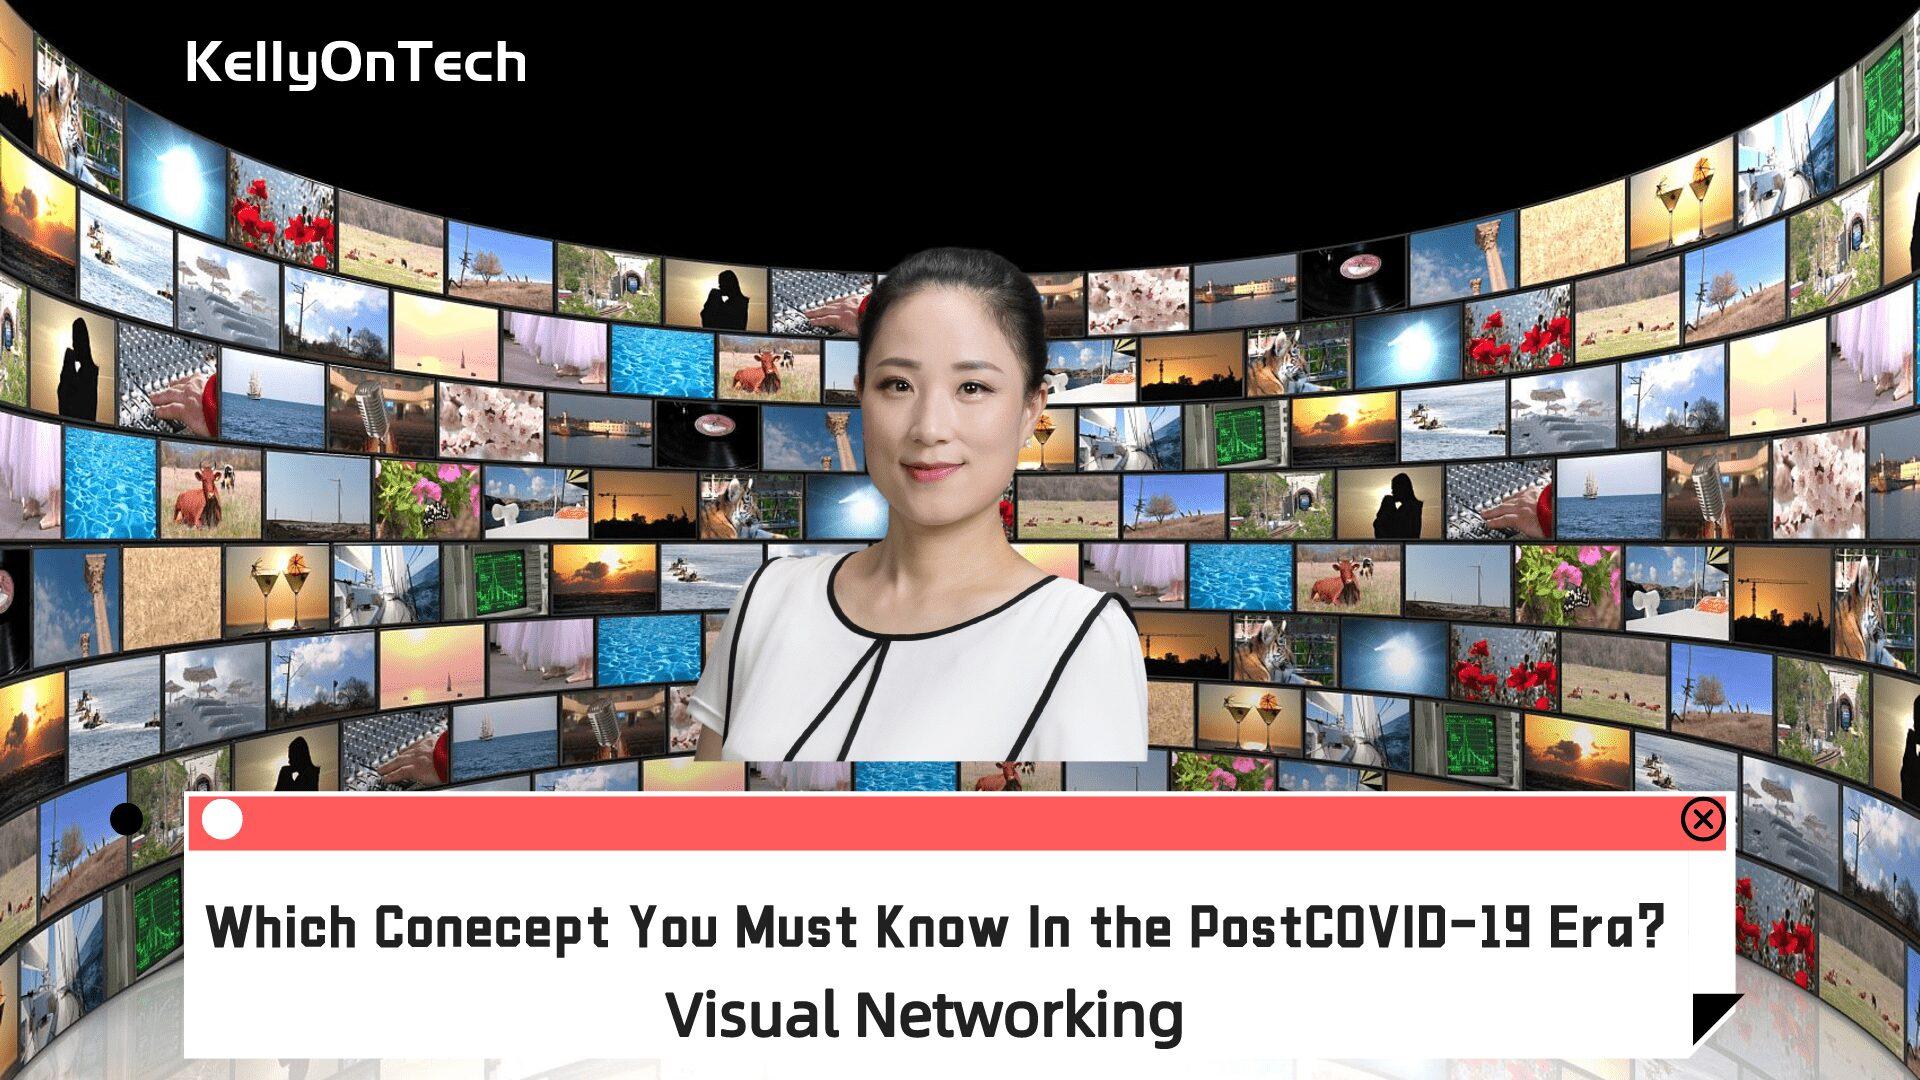 KellyOnTech Visual Networking